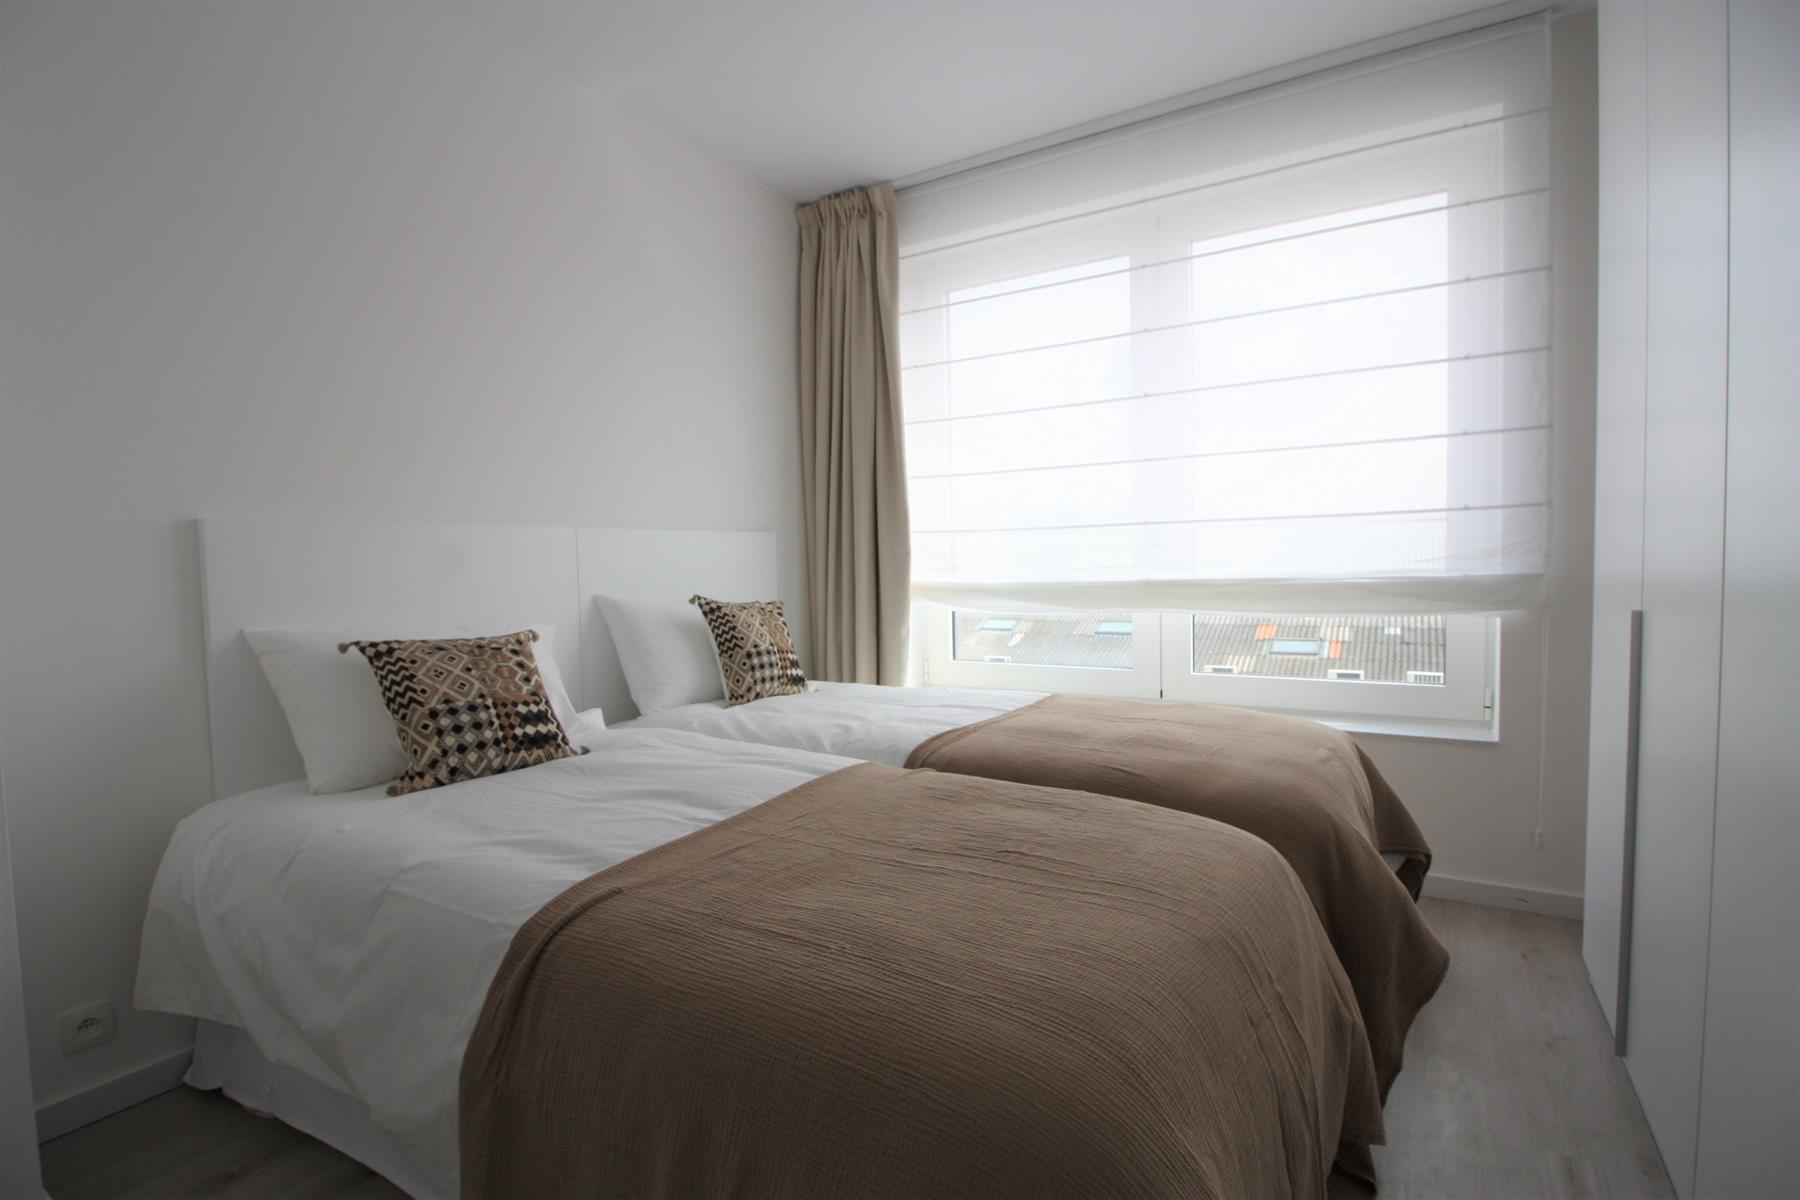 Appartement - Woluwe-Saint-Lambert - #4395355-14